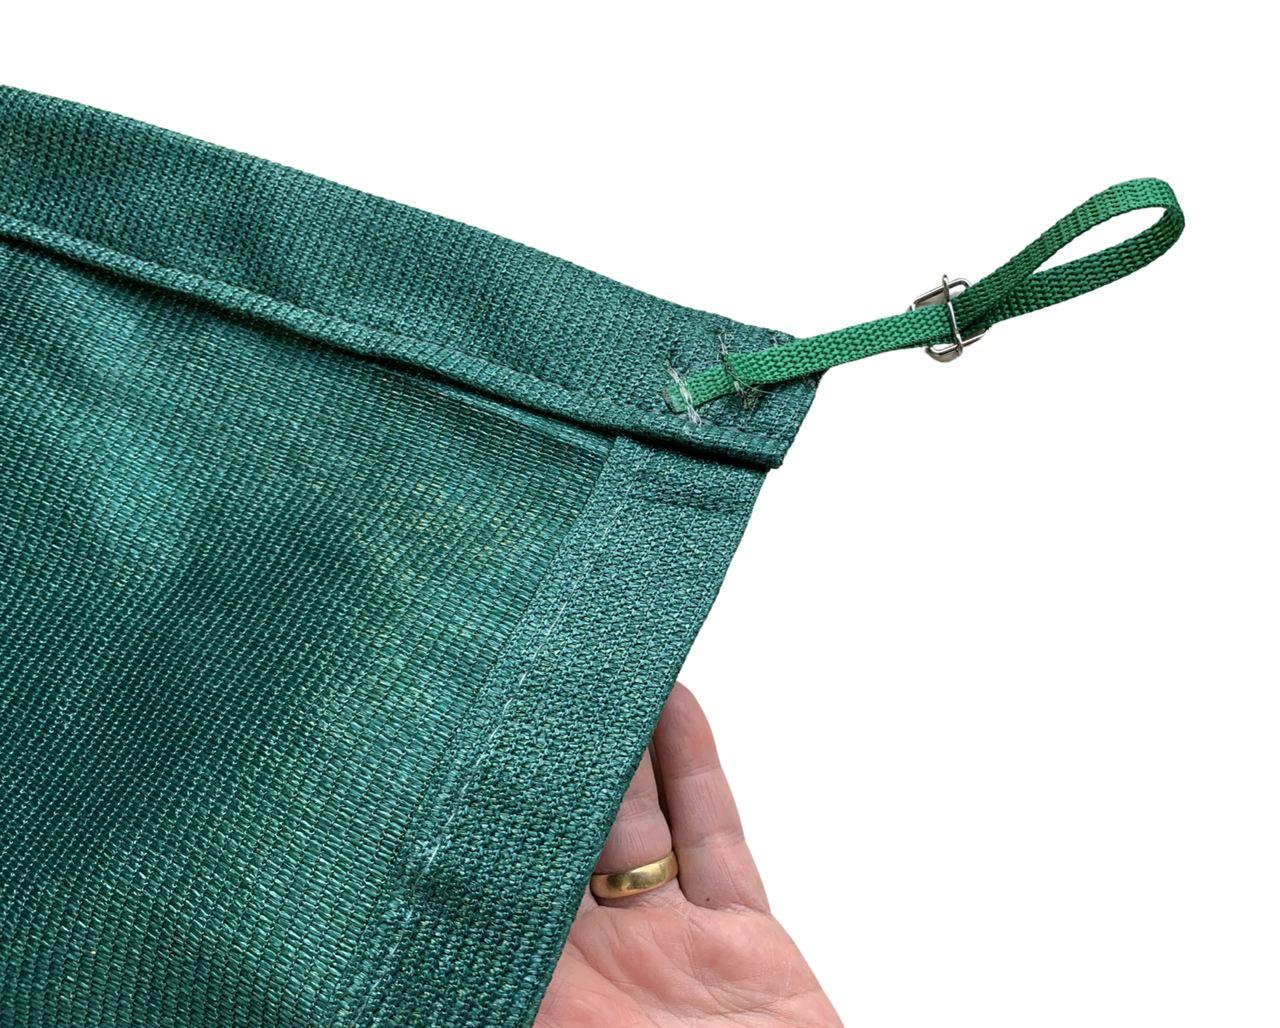 Tela de Sombreamento 90% Verde com Esticadores - Largura: 1,8 Metros